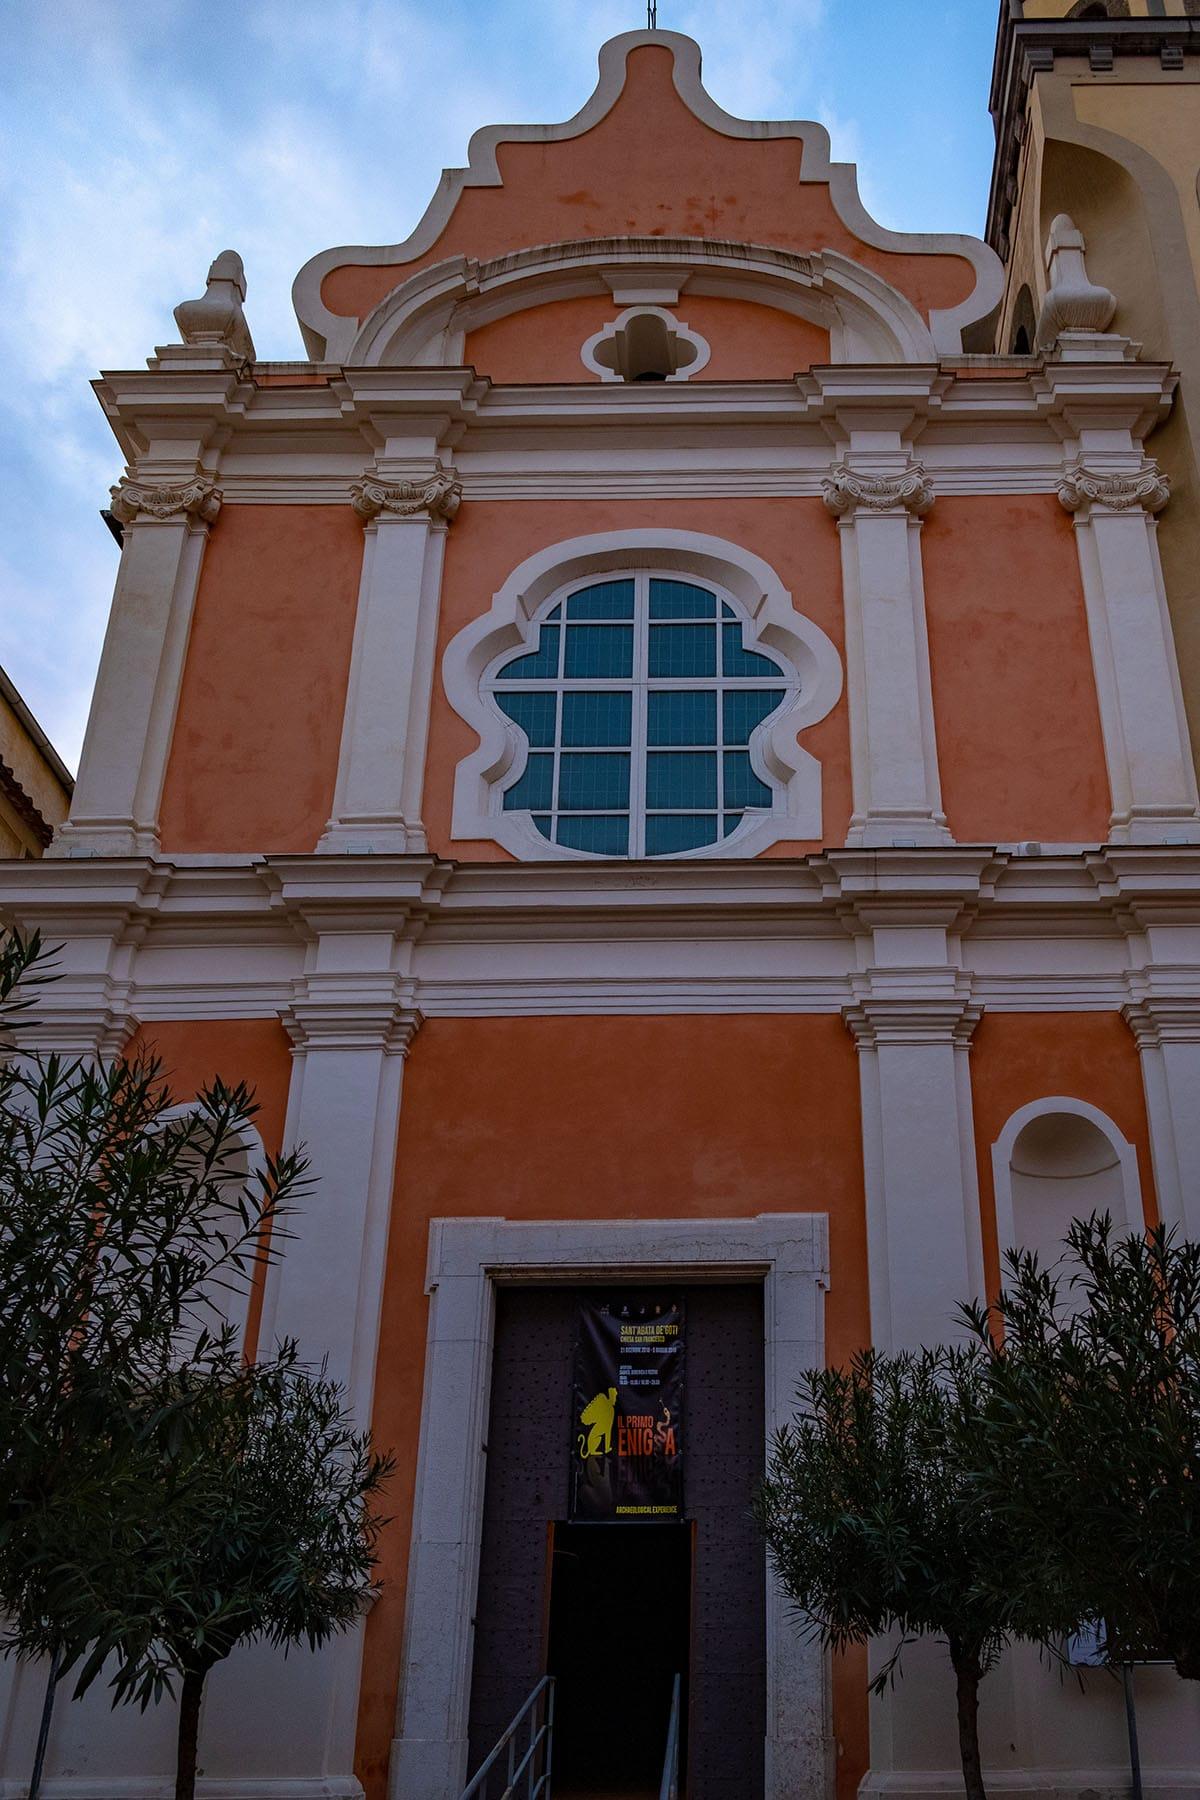 Chiesa di San Francesco a Sant'Agata de' Goti